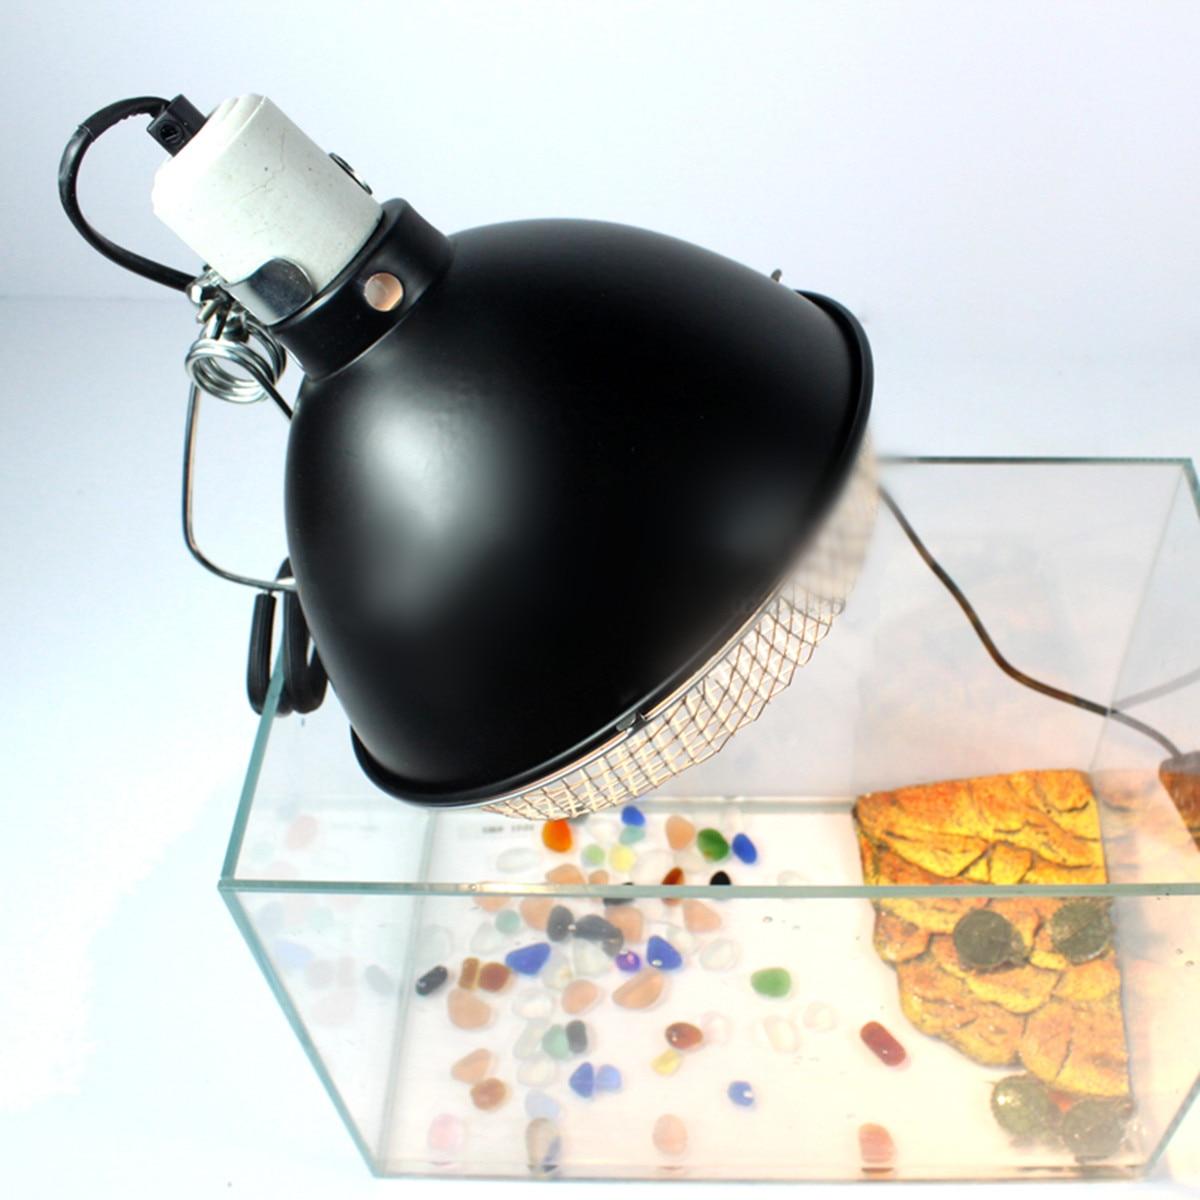 E27  Lamp Holder art deco UV Light Ceramic Aquarium Heater Vivarium Reptile Tortoise Turtle Snake Pet lamp shade With Switch Net